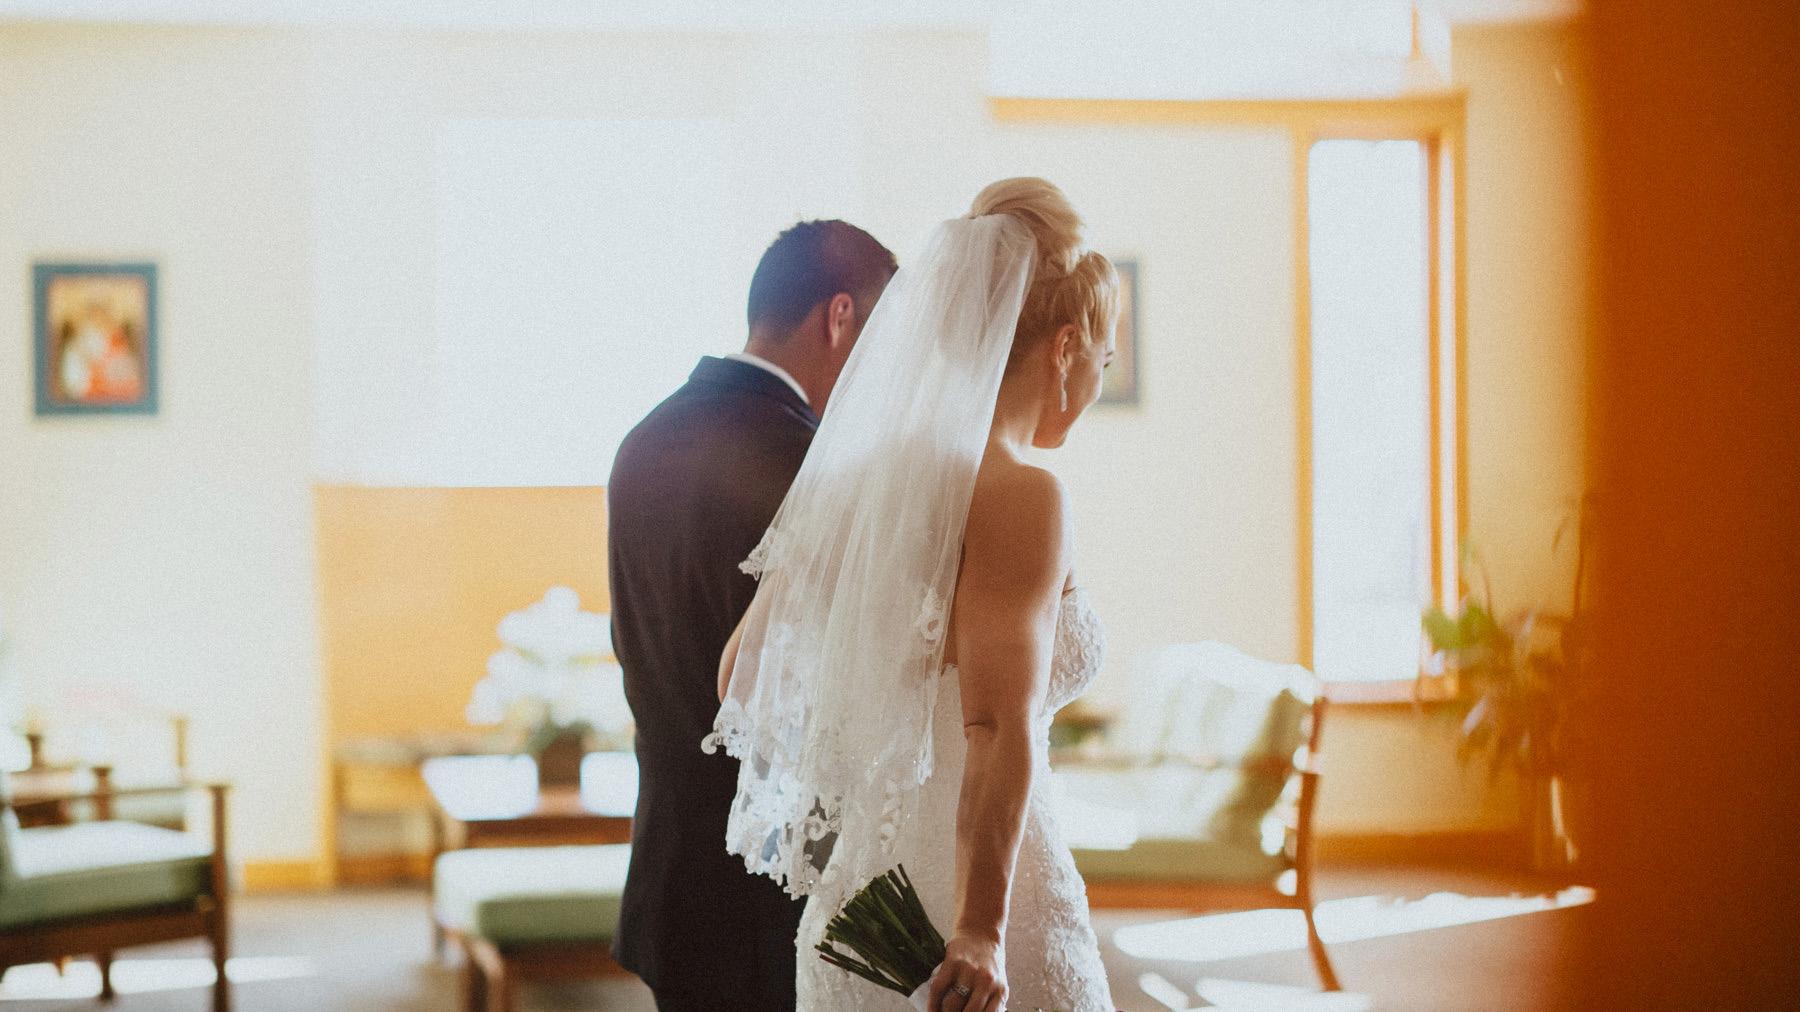 050-rockwood-carraige-house-wedding-1-3.jpg